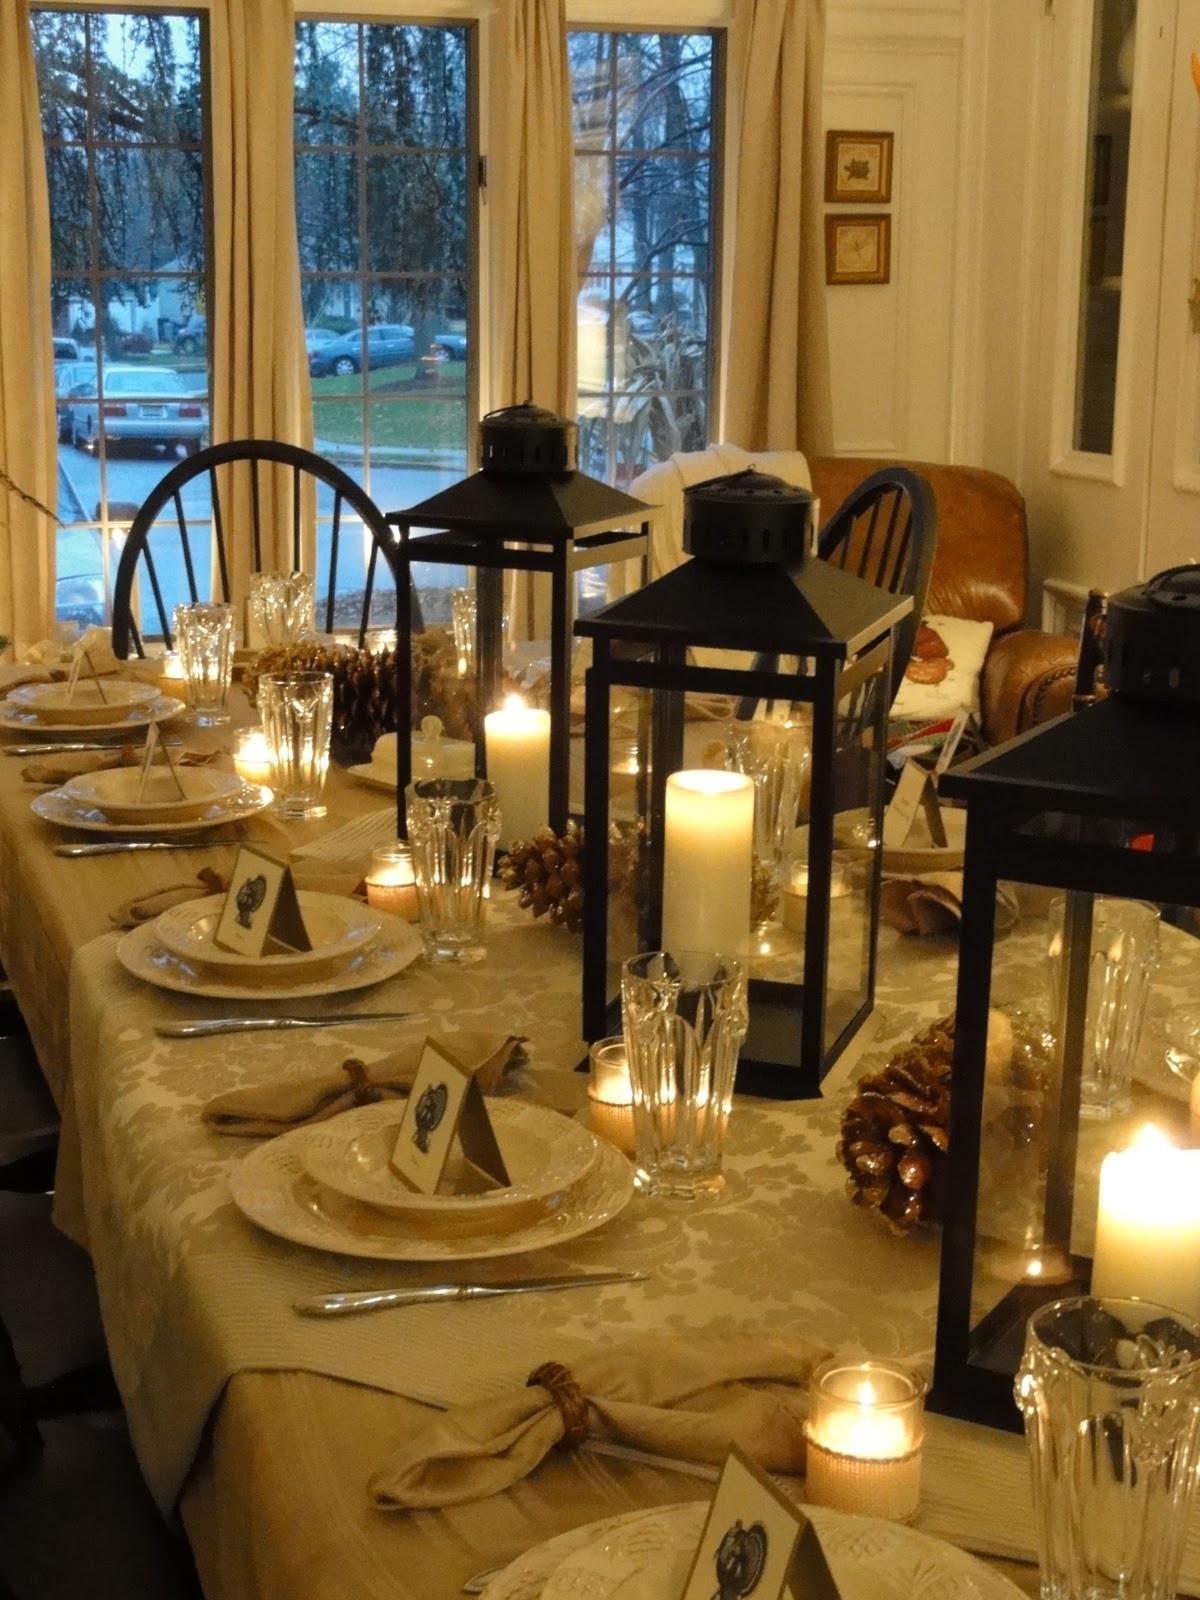 Thanksgiving Dinner Table Settings  16 Thanksgiving Table Ideas table setting